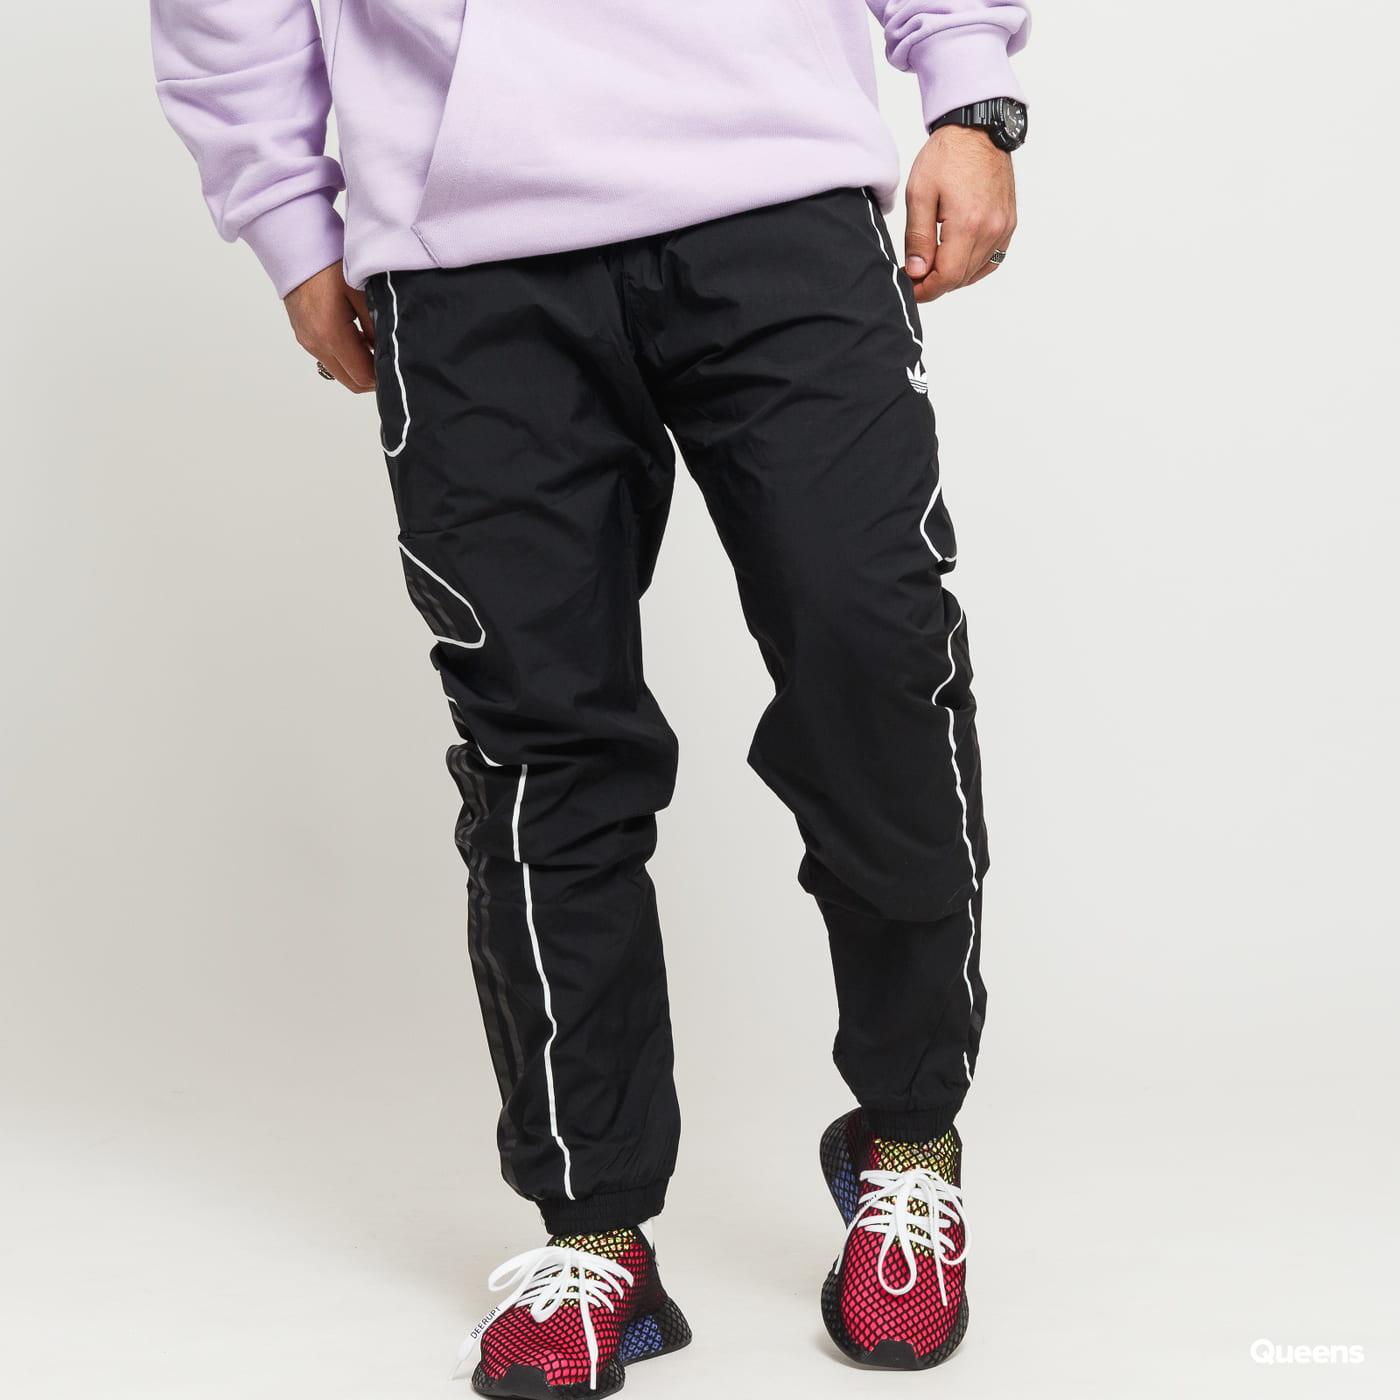 84b3eb6cfc adidas Originals Flamestrike Woven Track Pant black